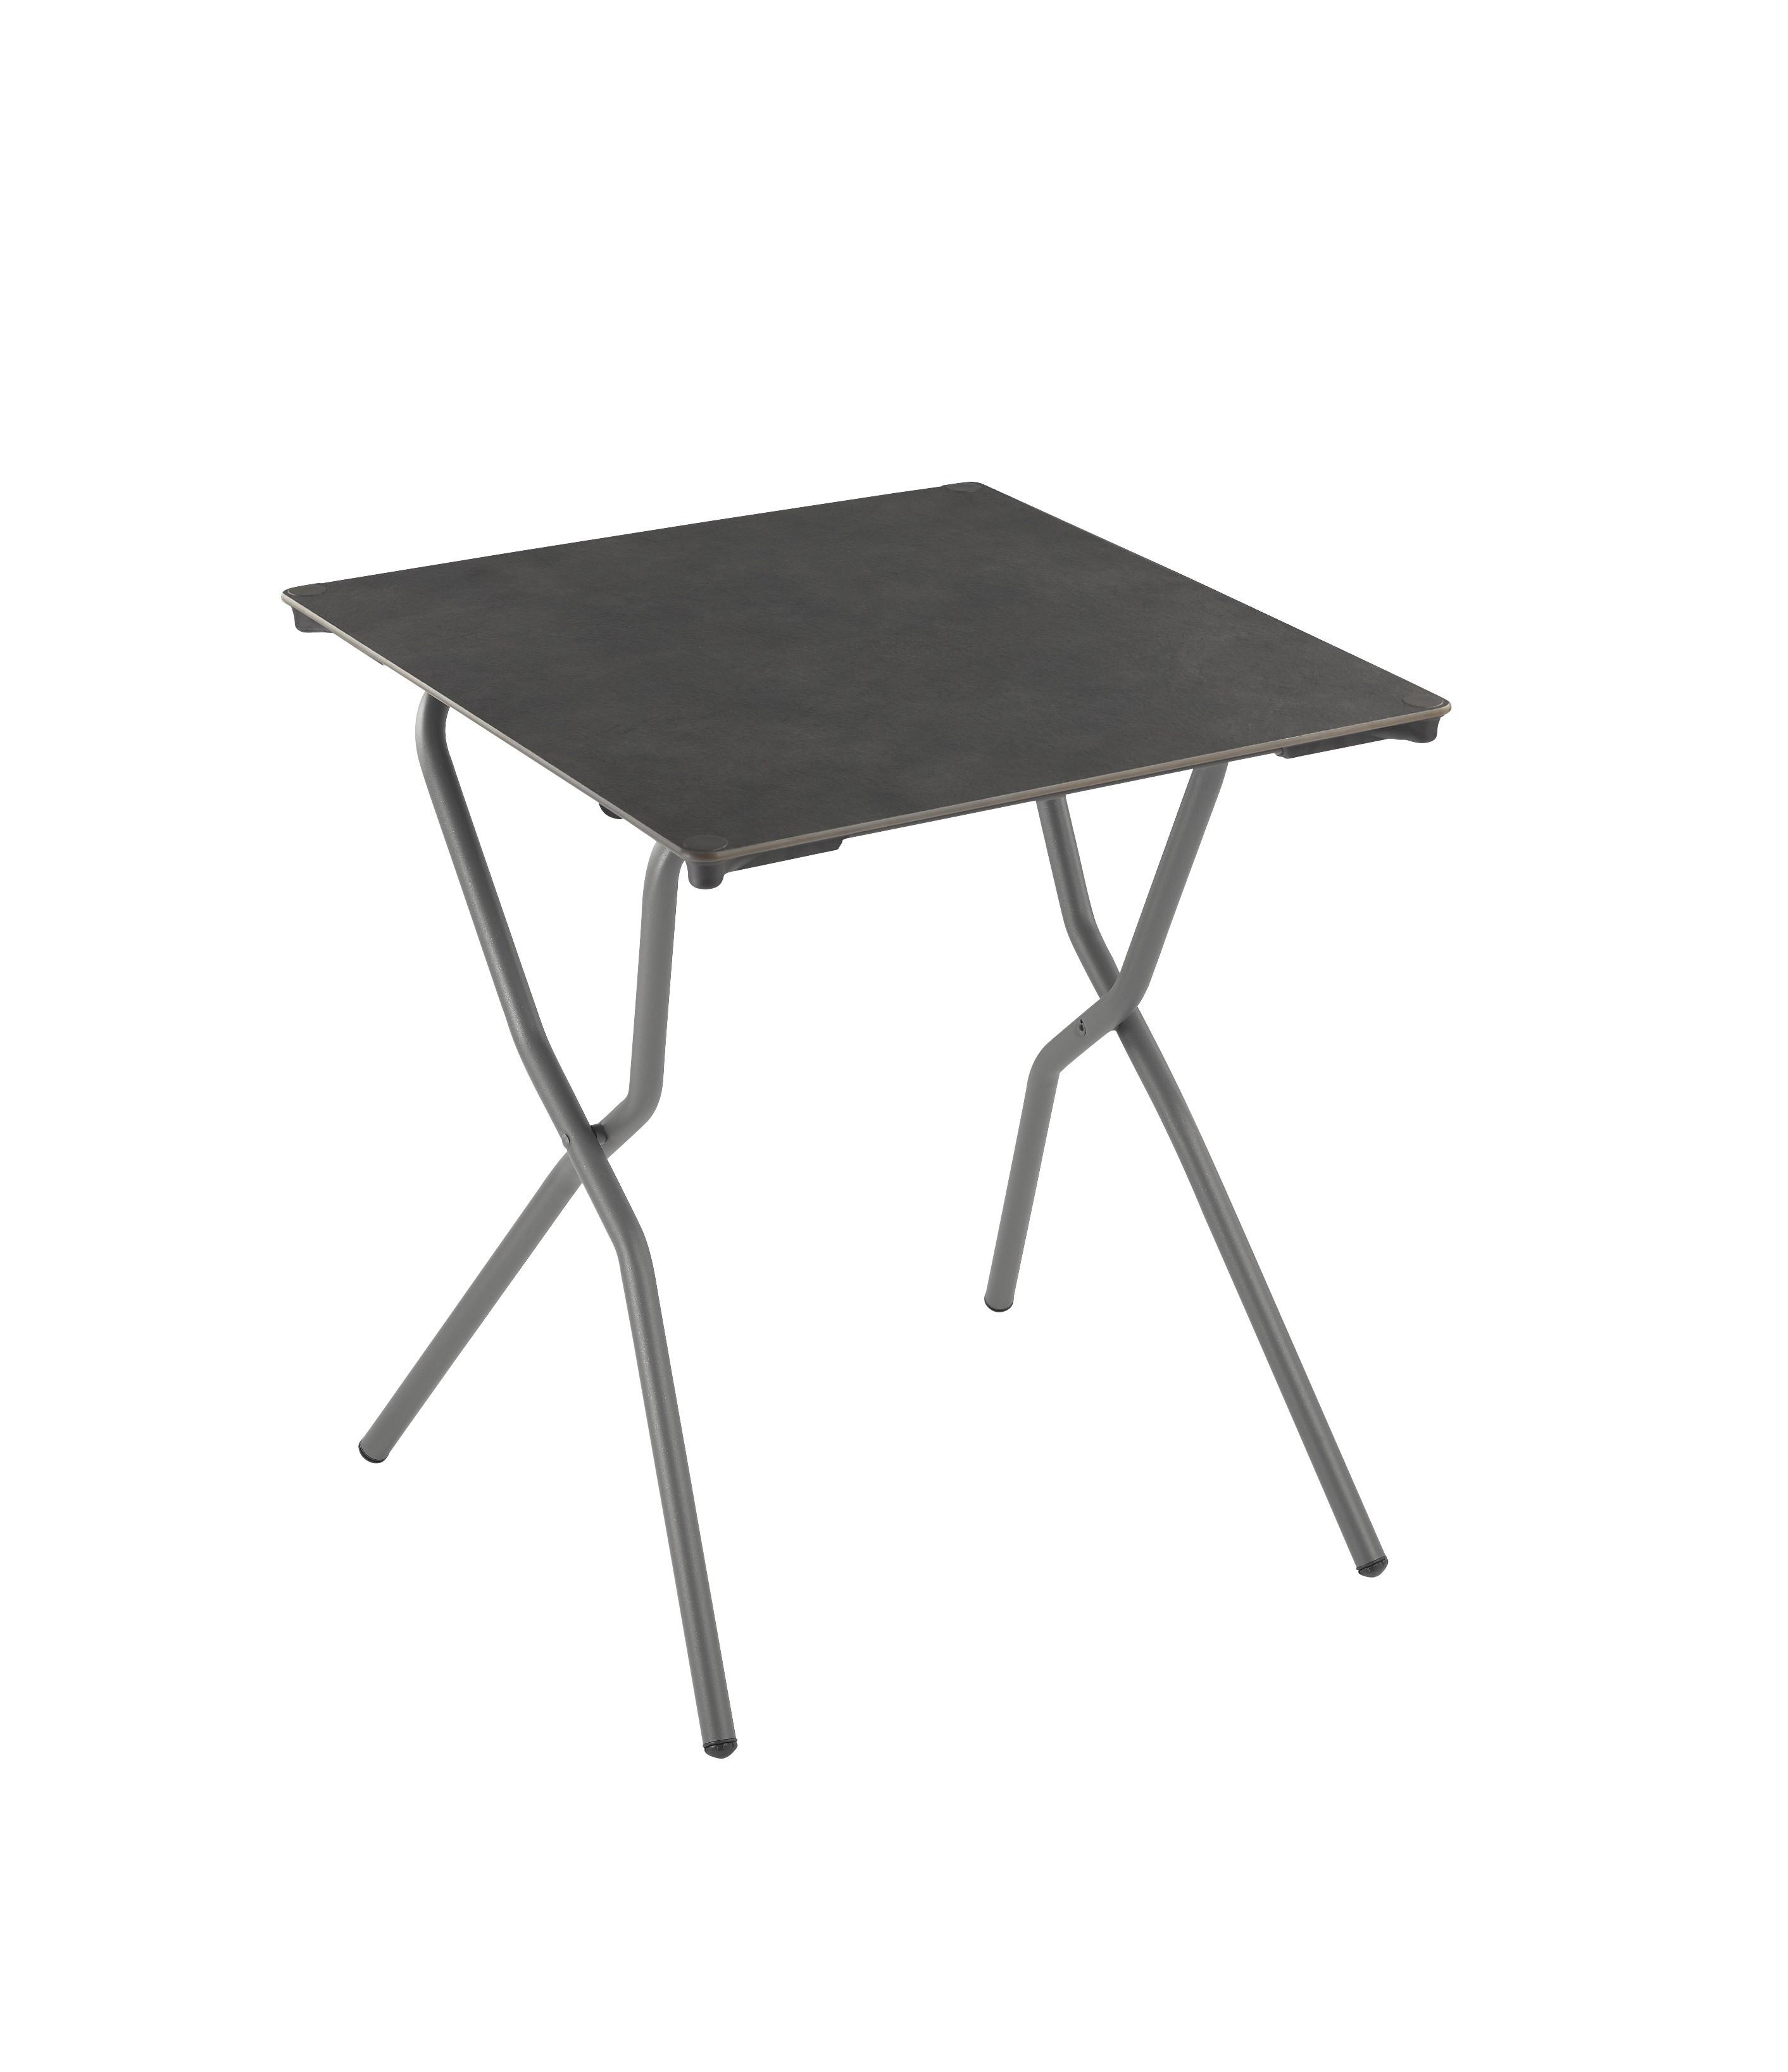 Table pliante ANYTIME de Lafuma, 68x64